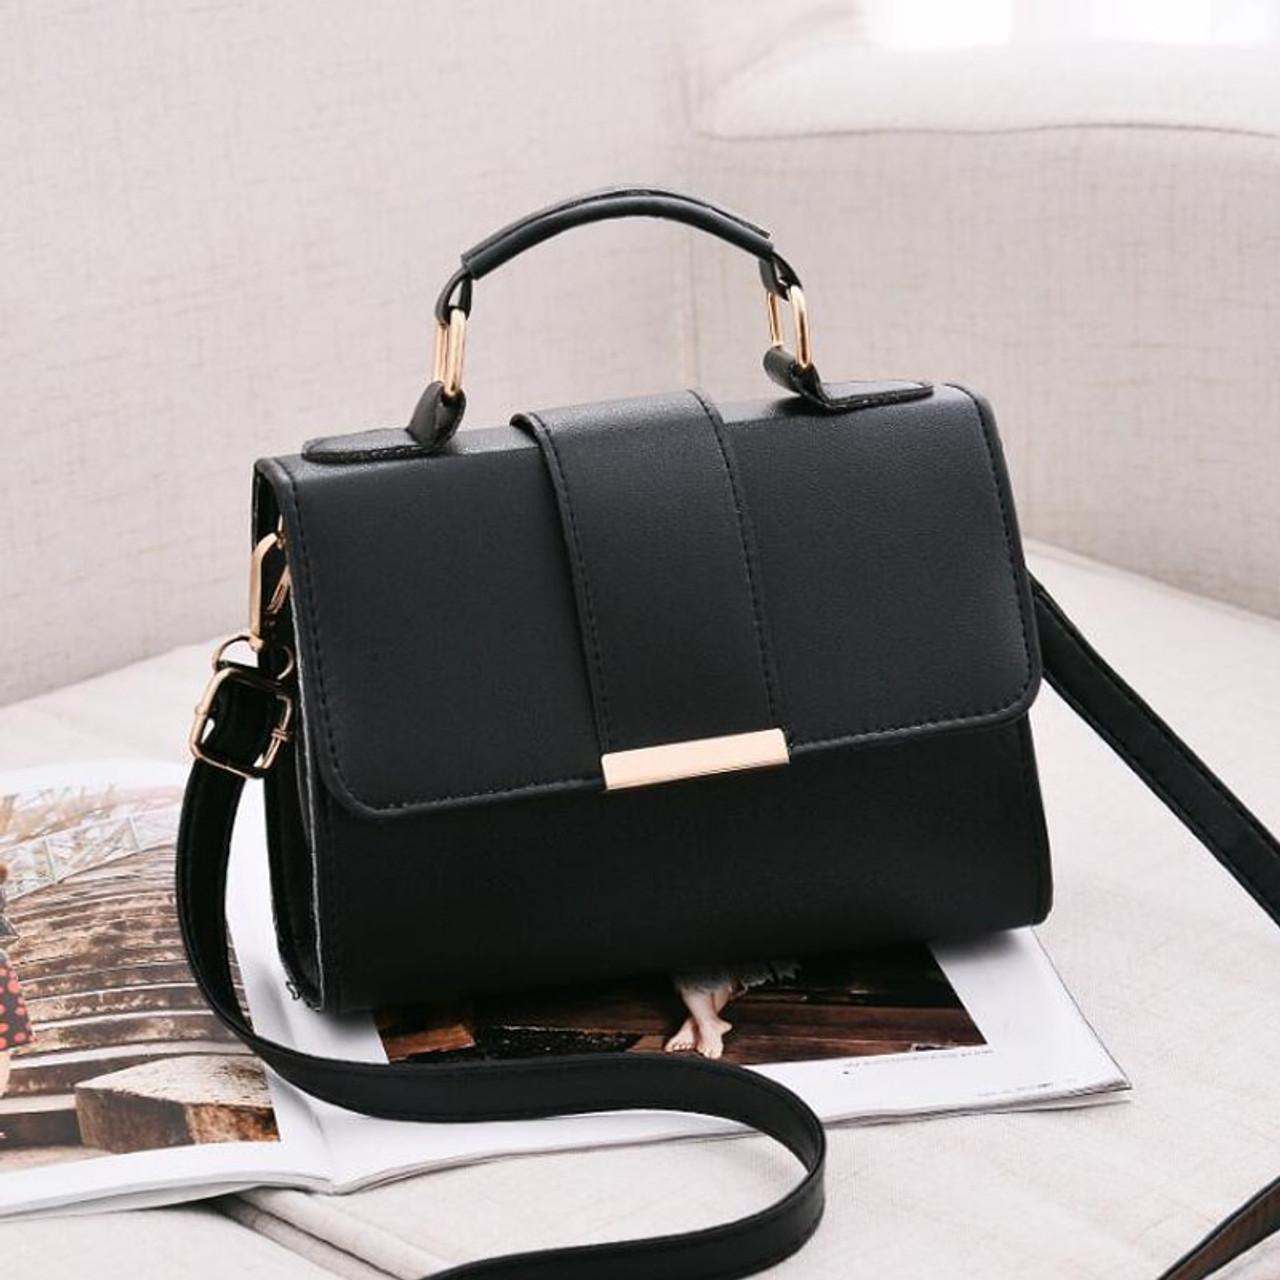 8fbb322ceb ... REPRCLA 2018 Summer Fashion Women Bag Leather Handbags PU Shoulder Bag  Small Flap Crossbody Bags for ...